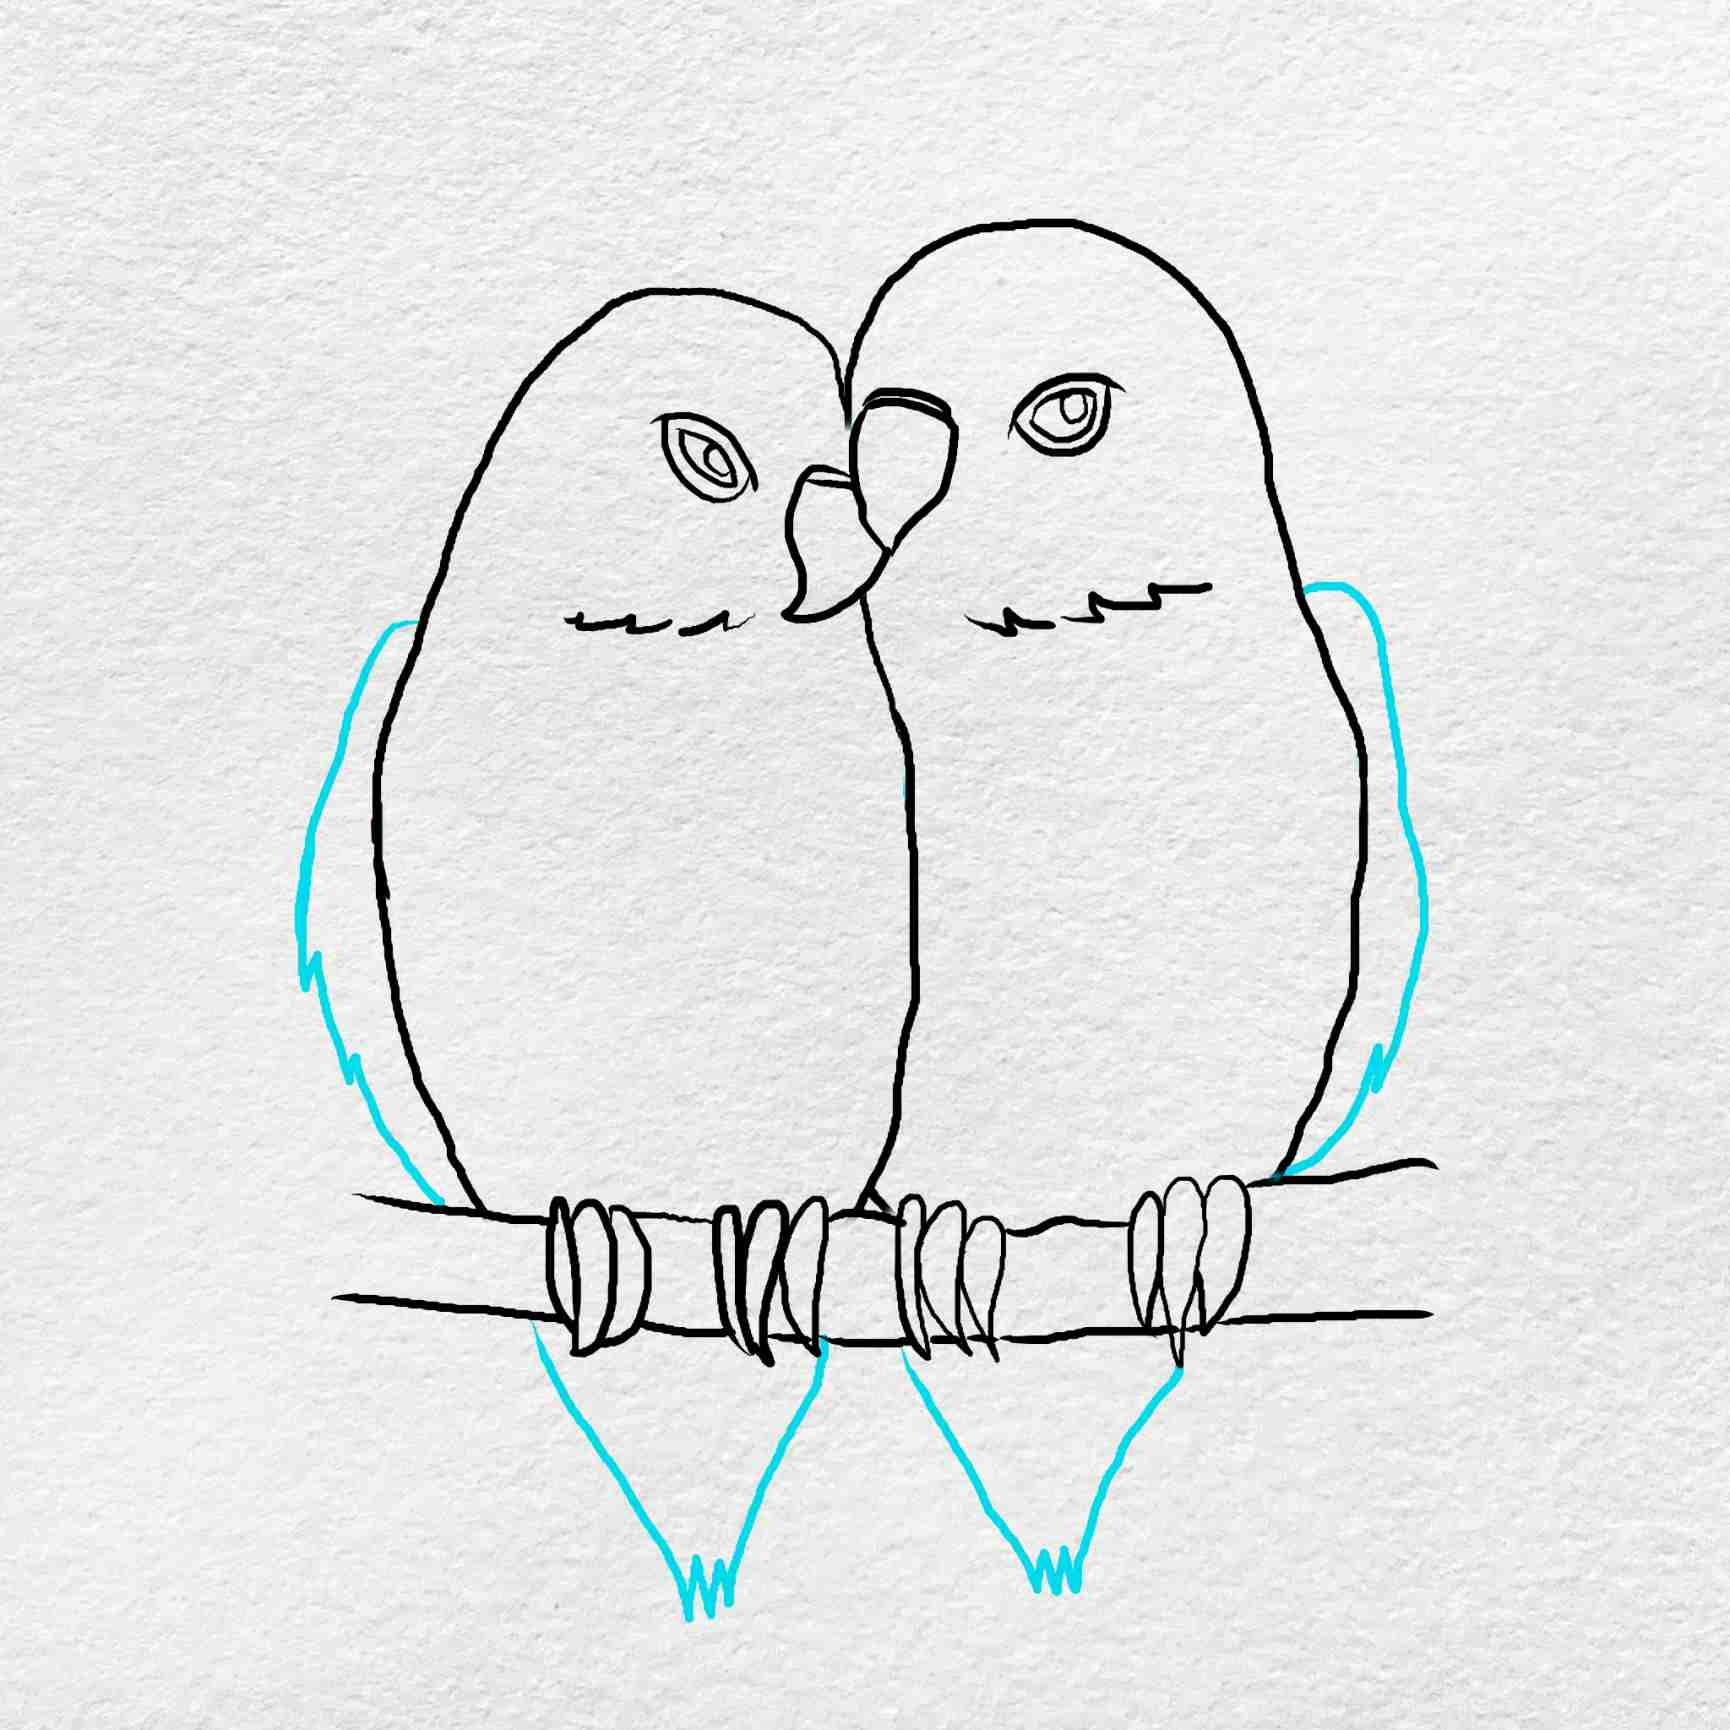 How To Draw Love Birds: Step 5